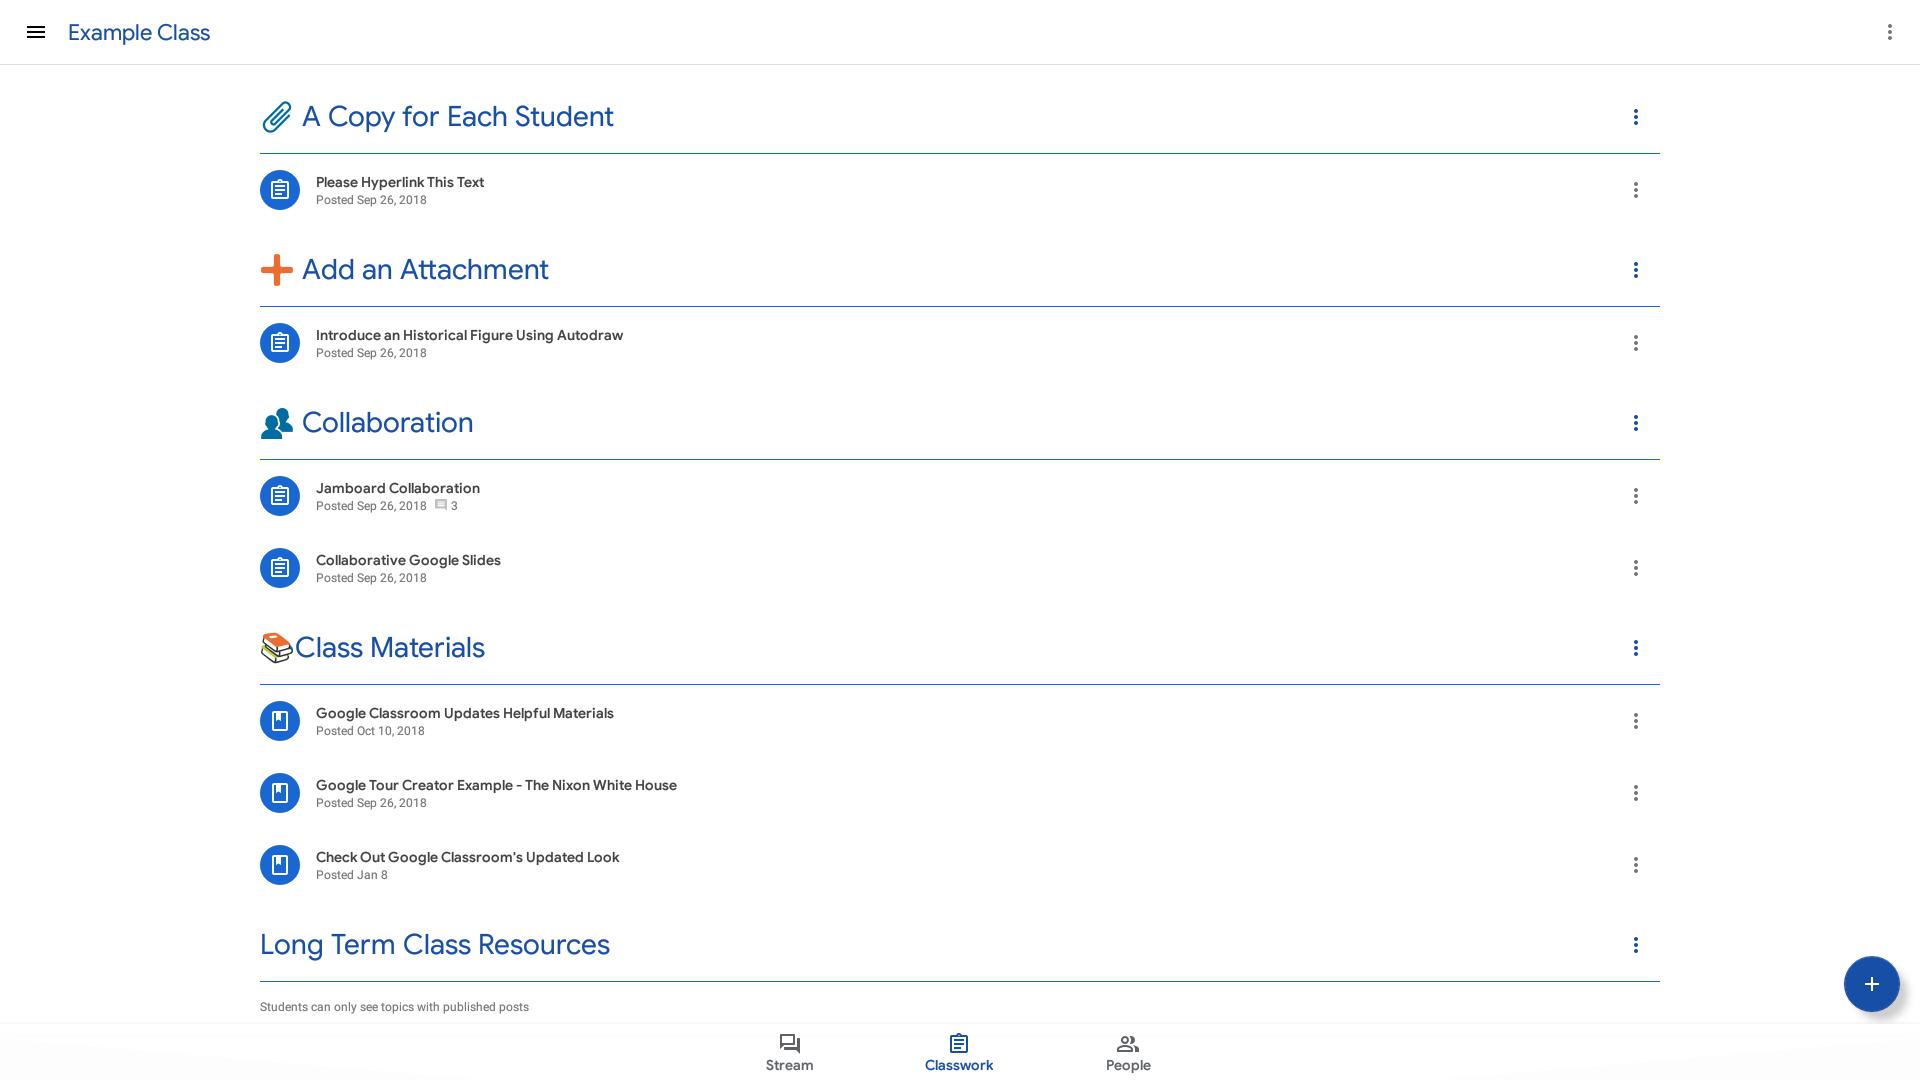 Screenshot of the updated Google Classroom Classwork tab